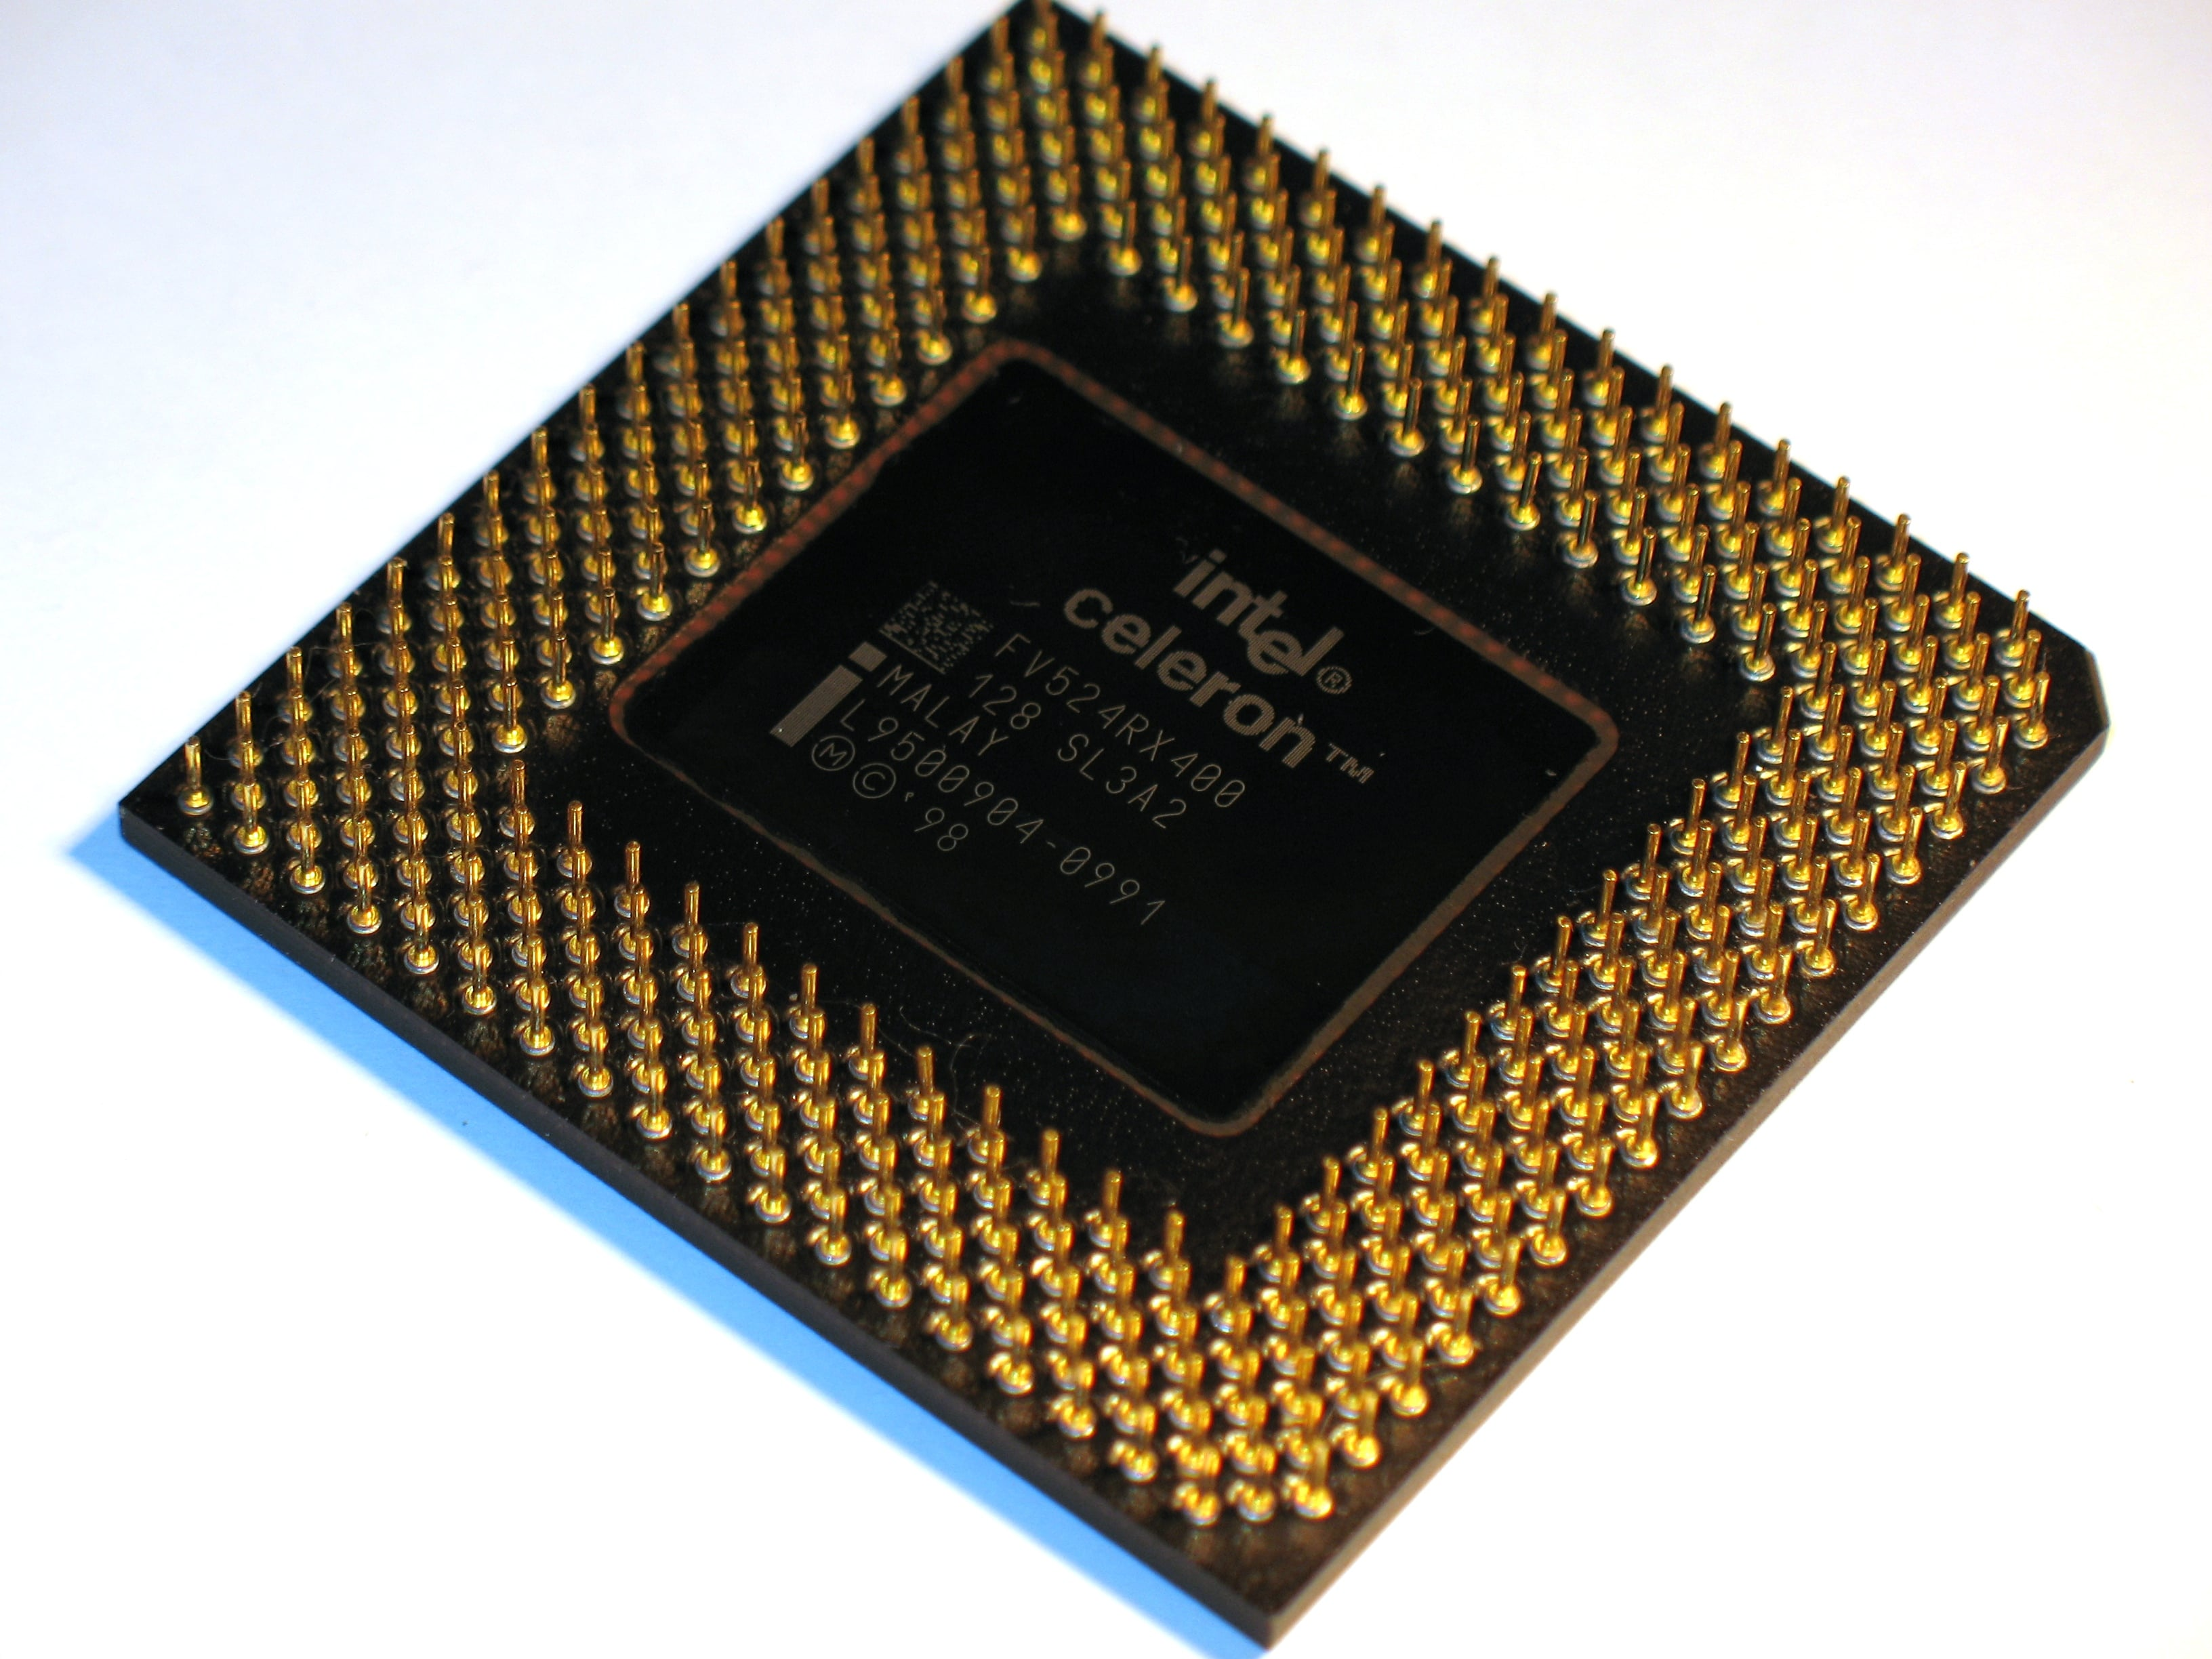 celeron mikroprocesor